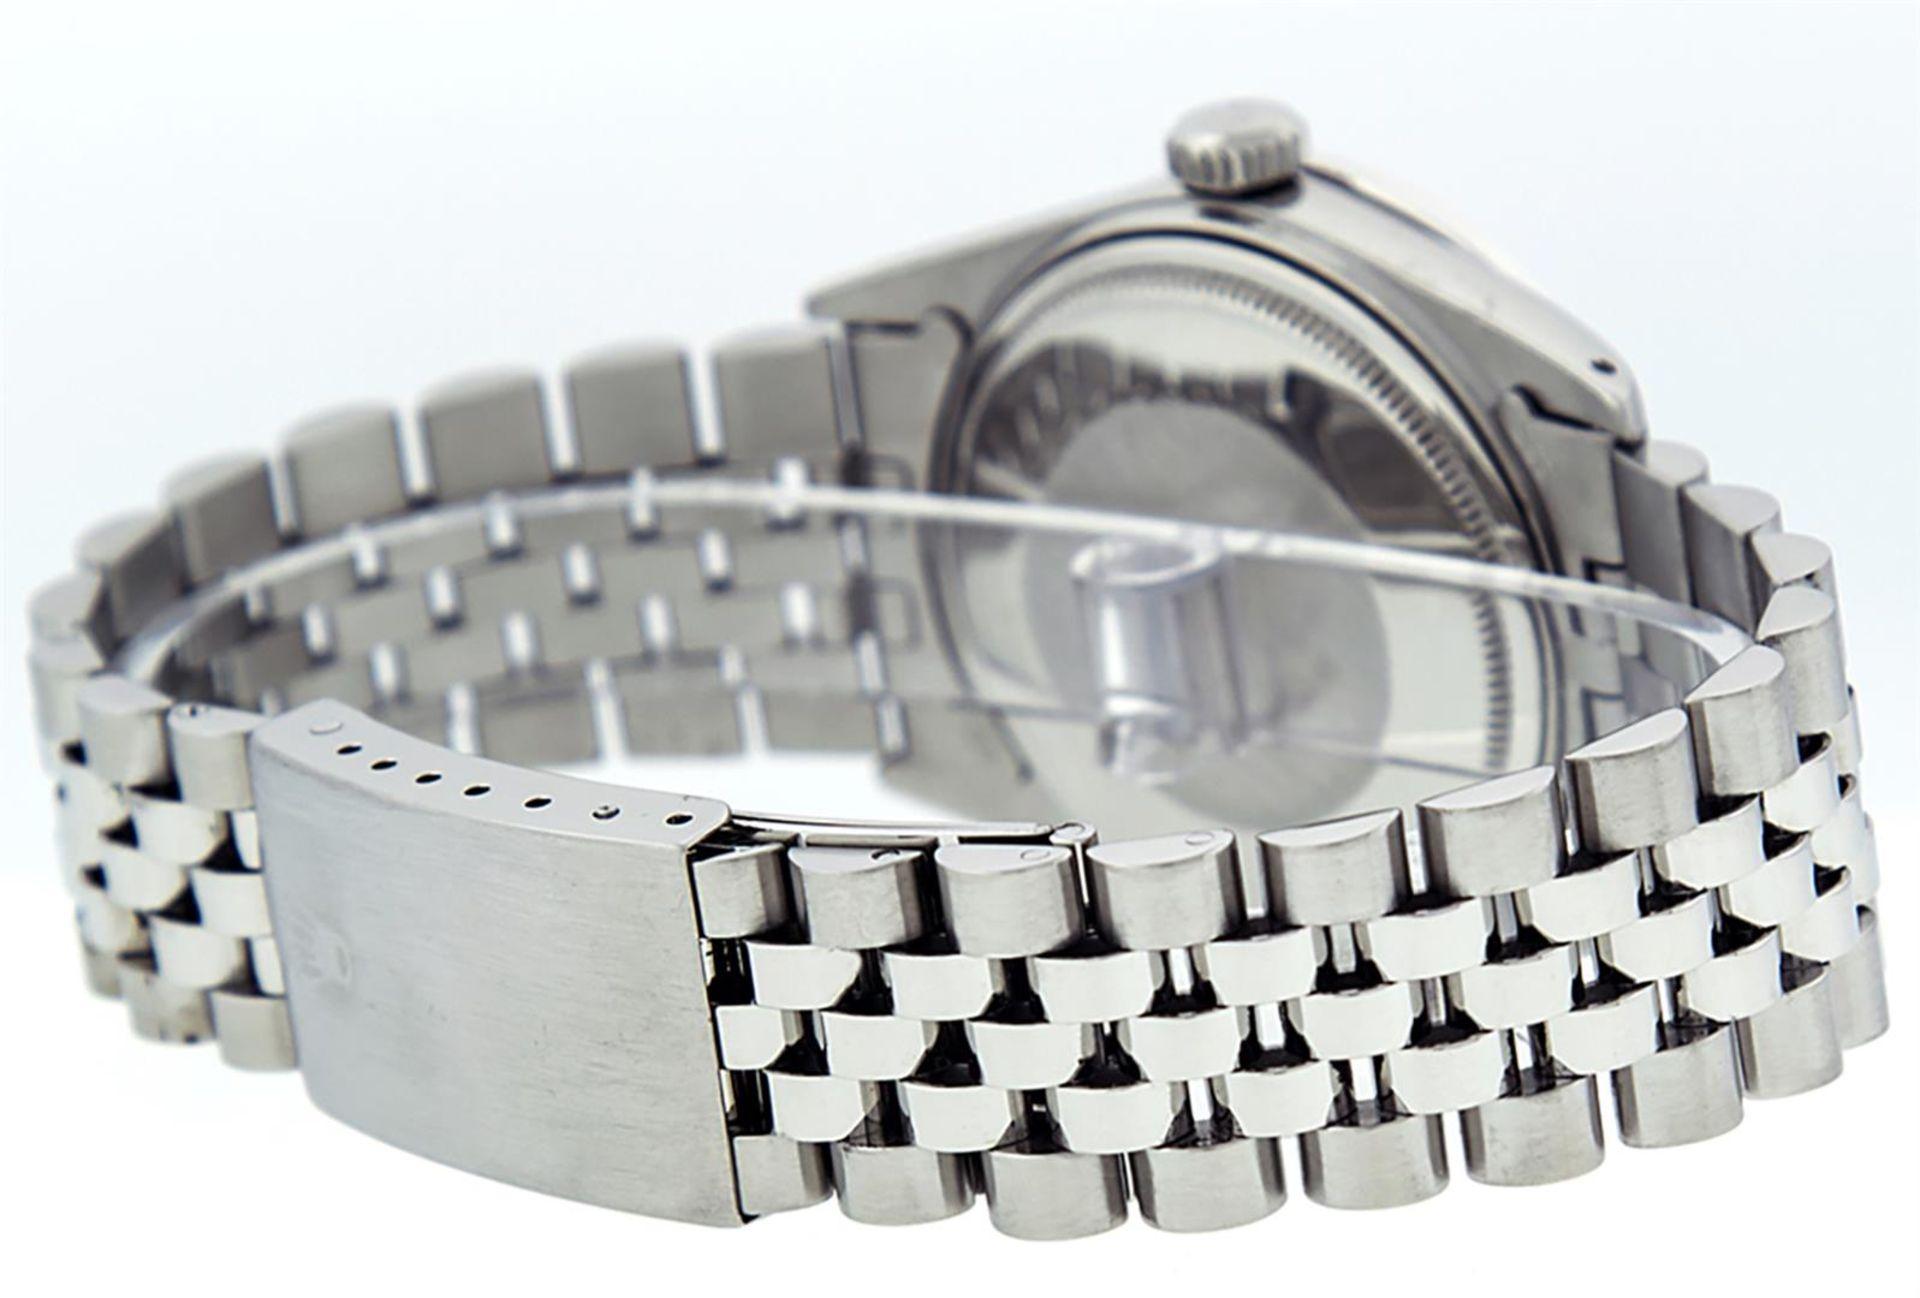 Rolex Mens Stainless Steel 36MM Blue Diamond Datejust Wristwatch - Image 5 of 9